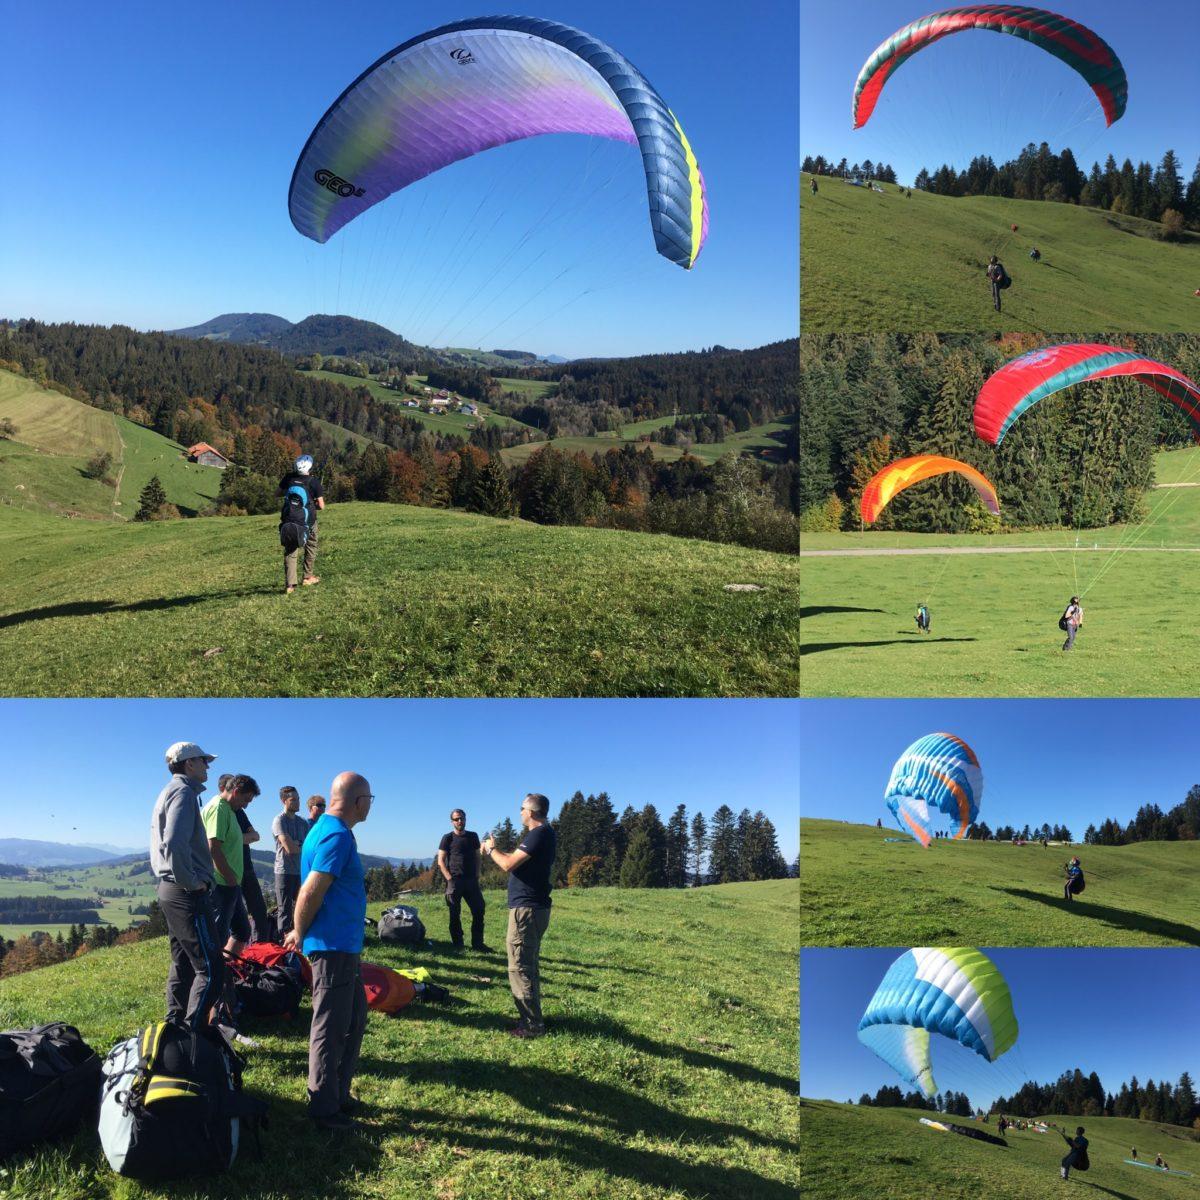 IMG 1151 - TakeOff3 - The Wind of Schwanden ....